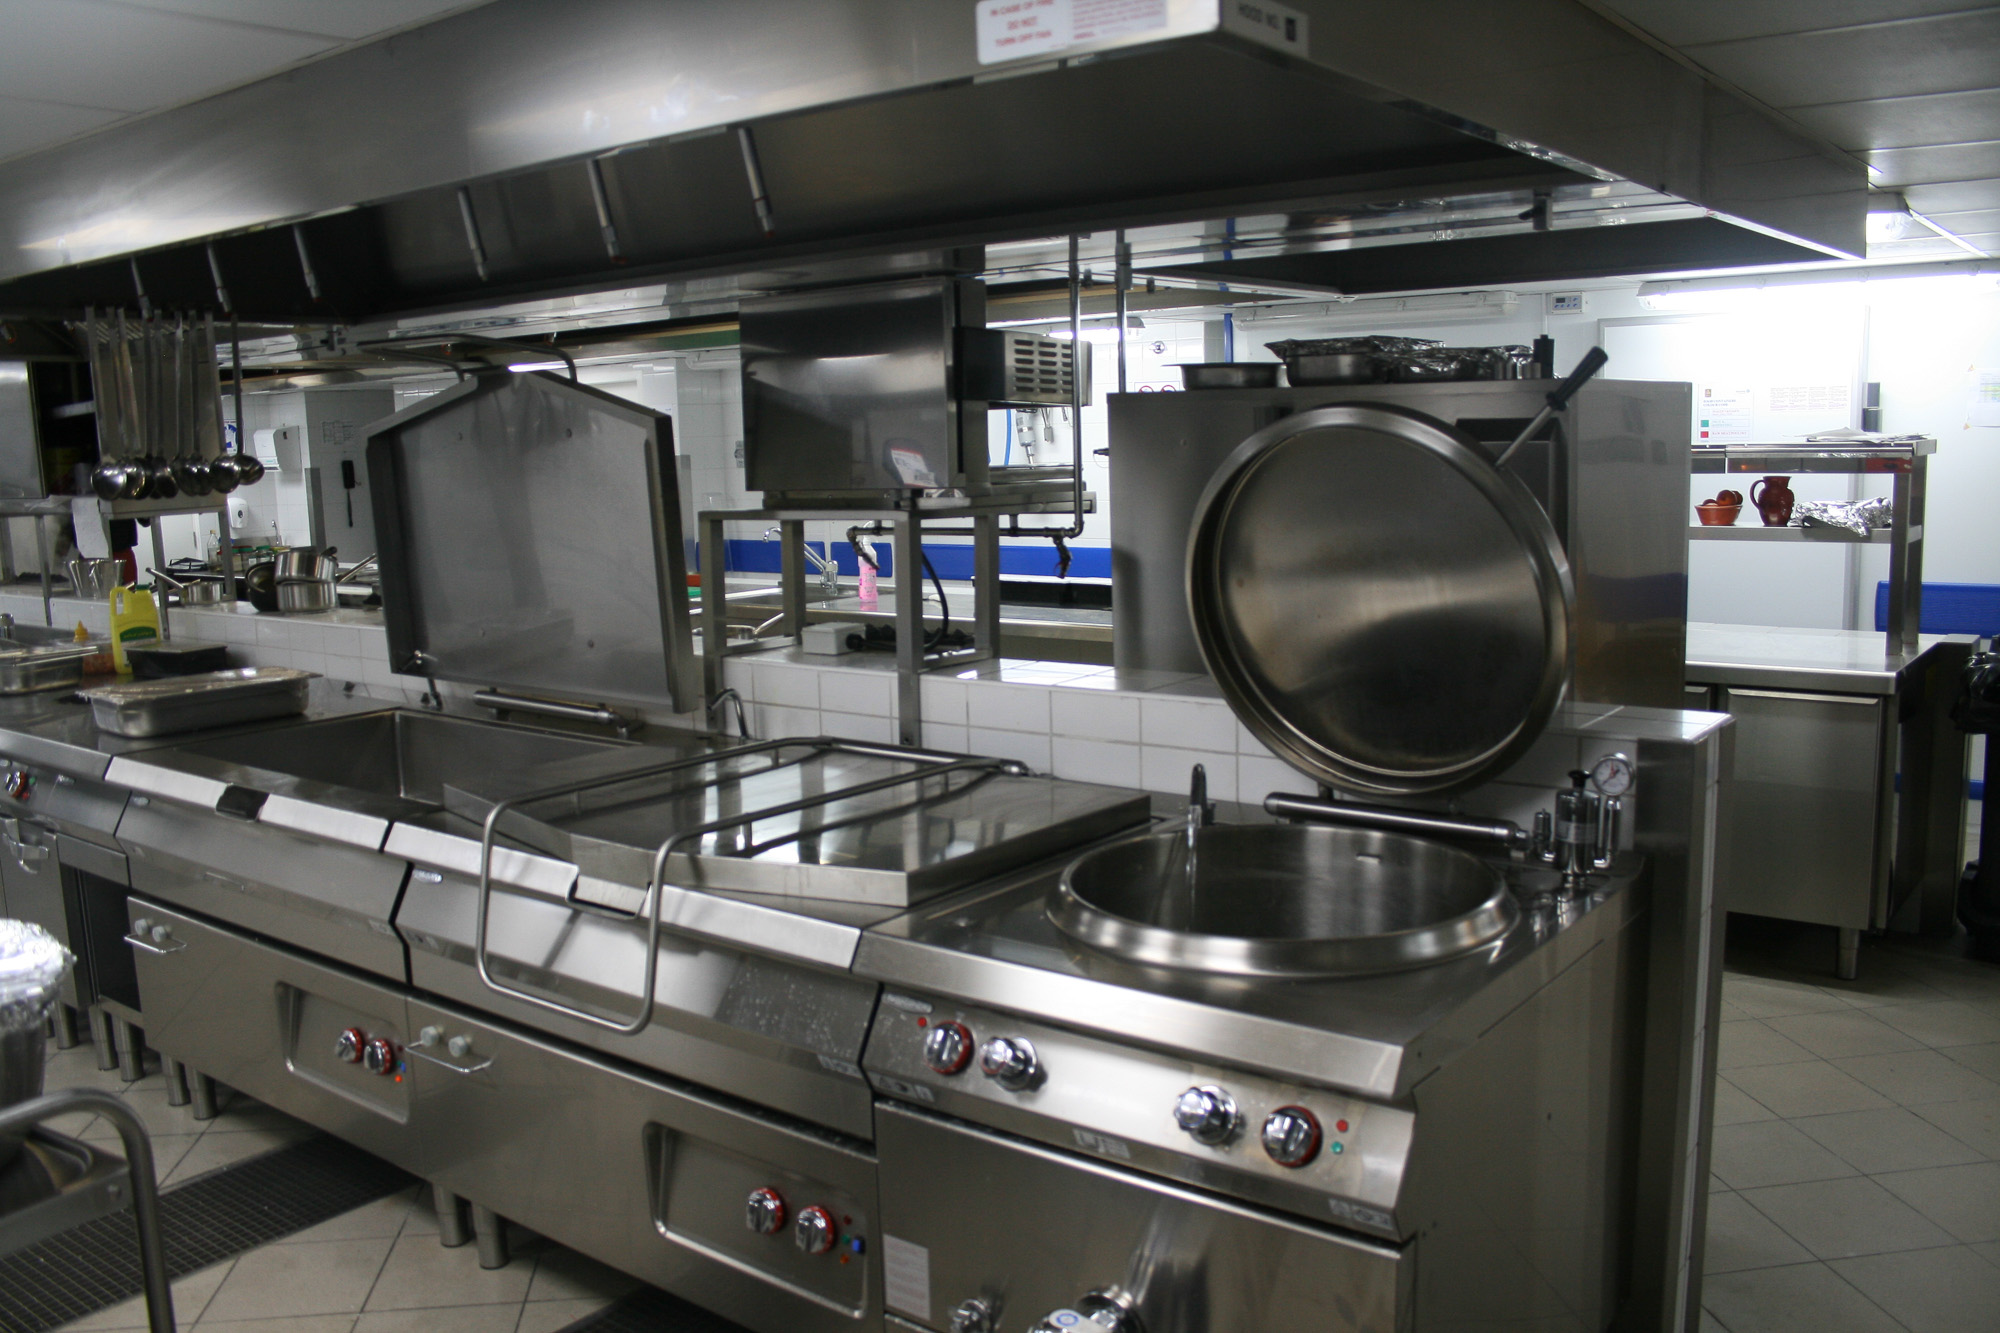 Italia_kitchen_-le_meridien_r-1